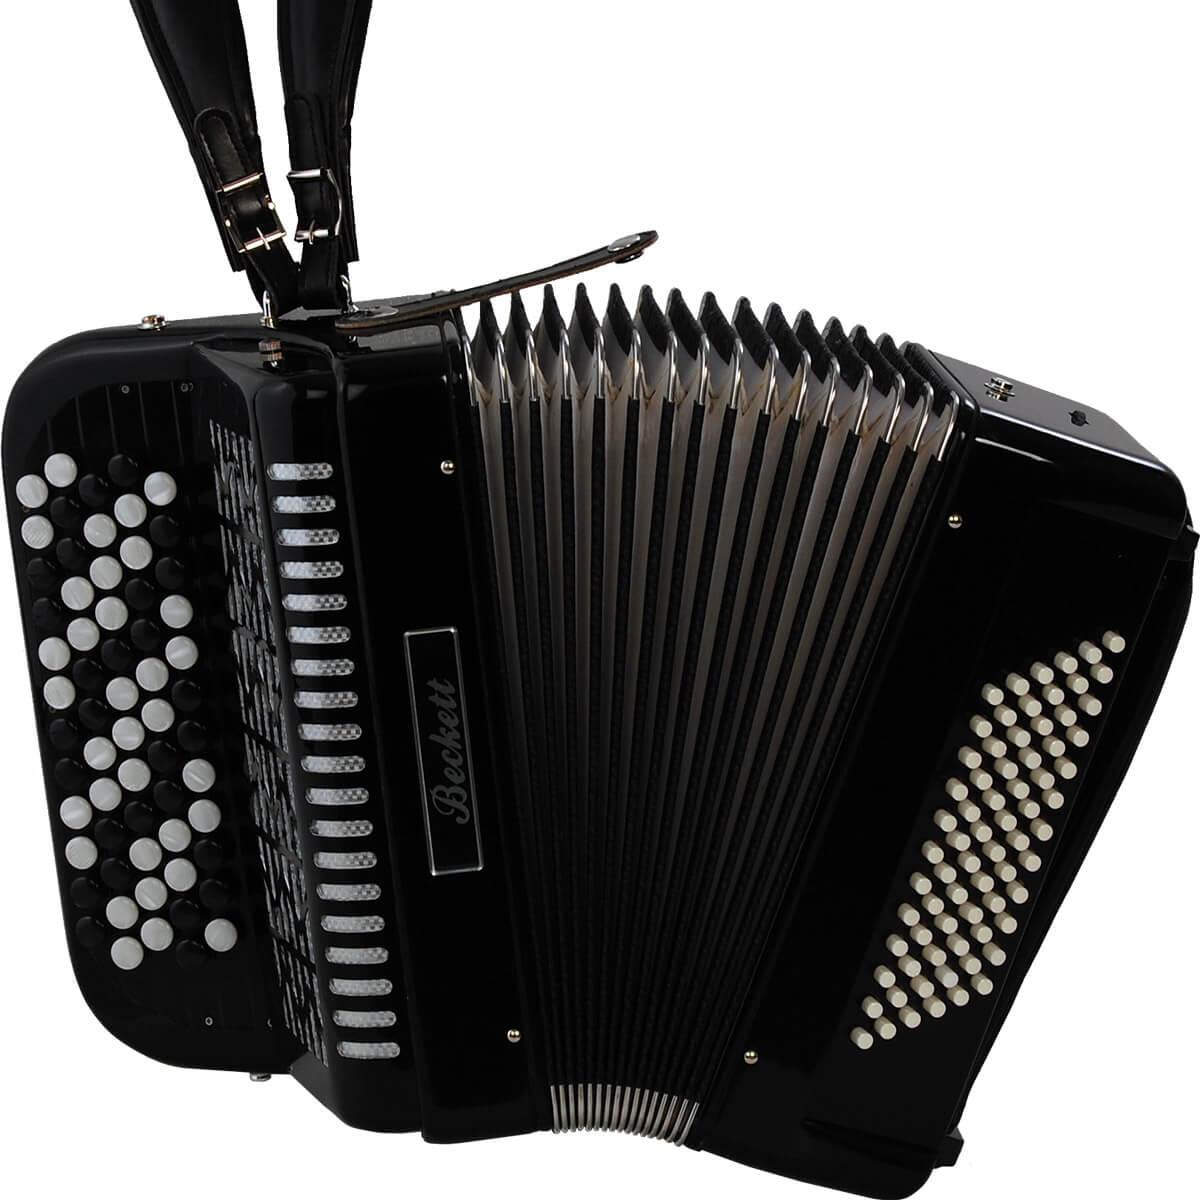 Beckett JH5072 knap-harmonika sort